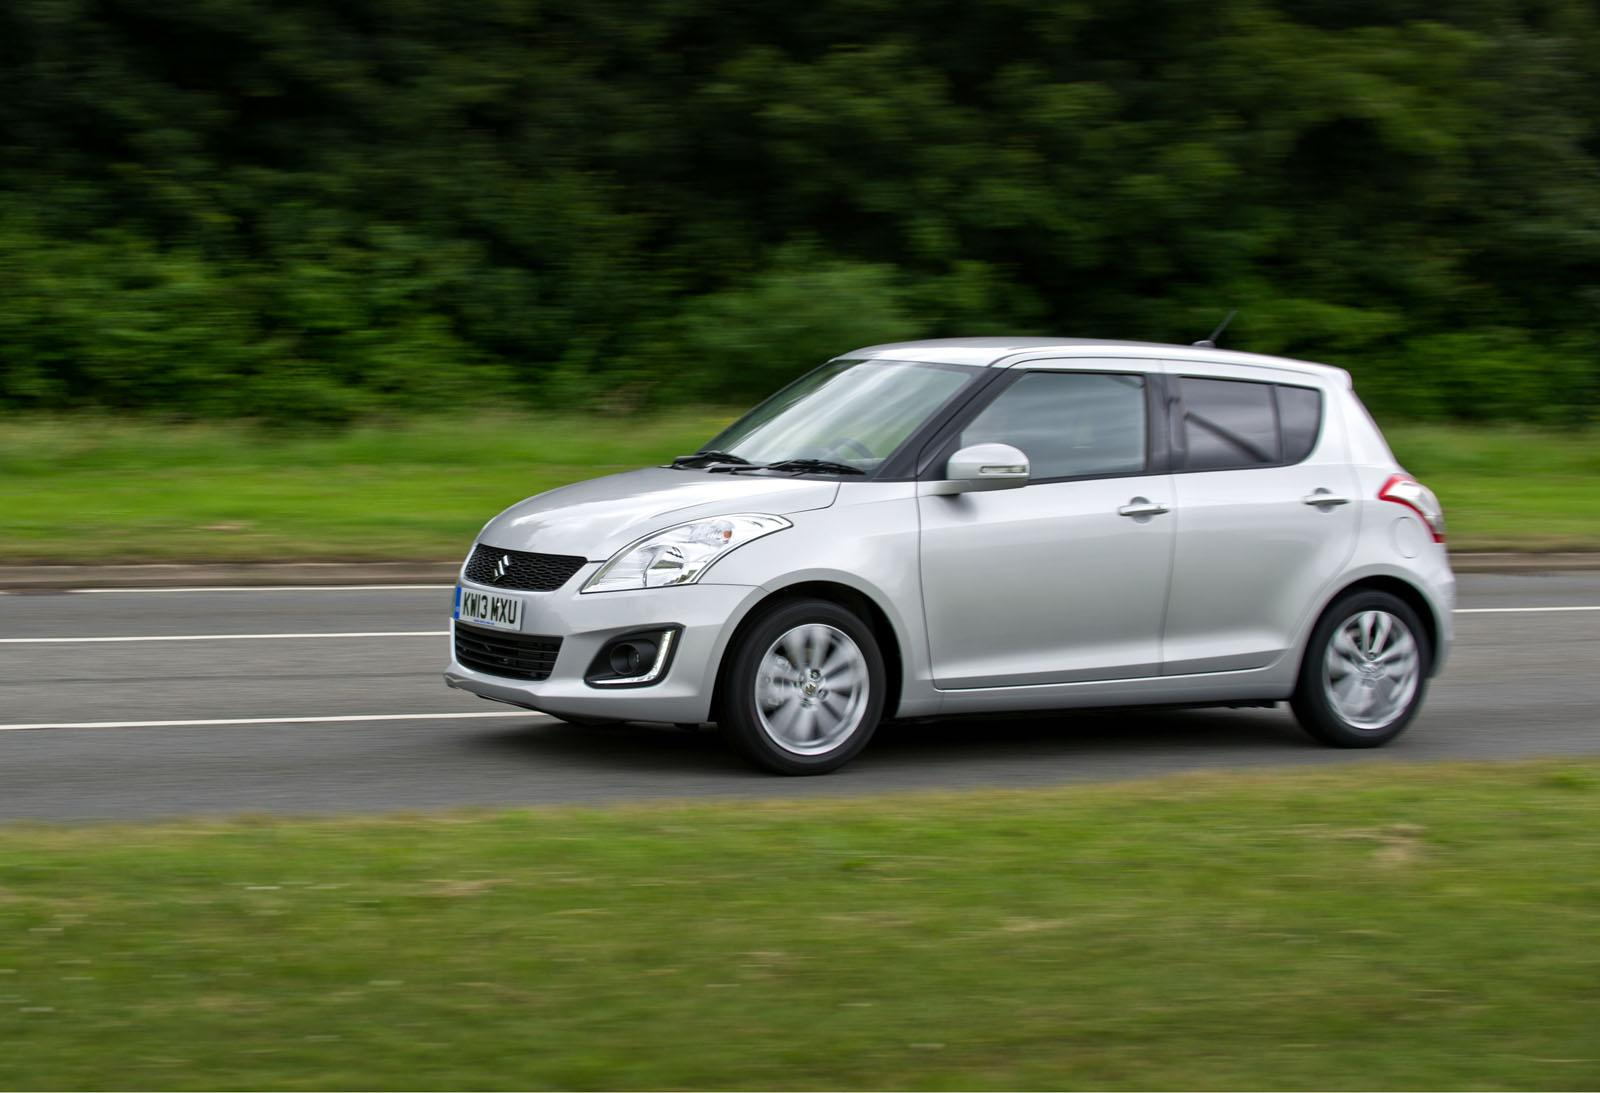 Maruti Swift 2013 Price 2013-Maruti-Suzuki-Swift-